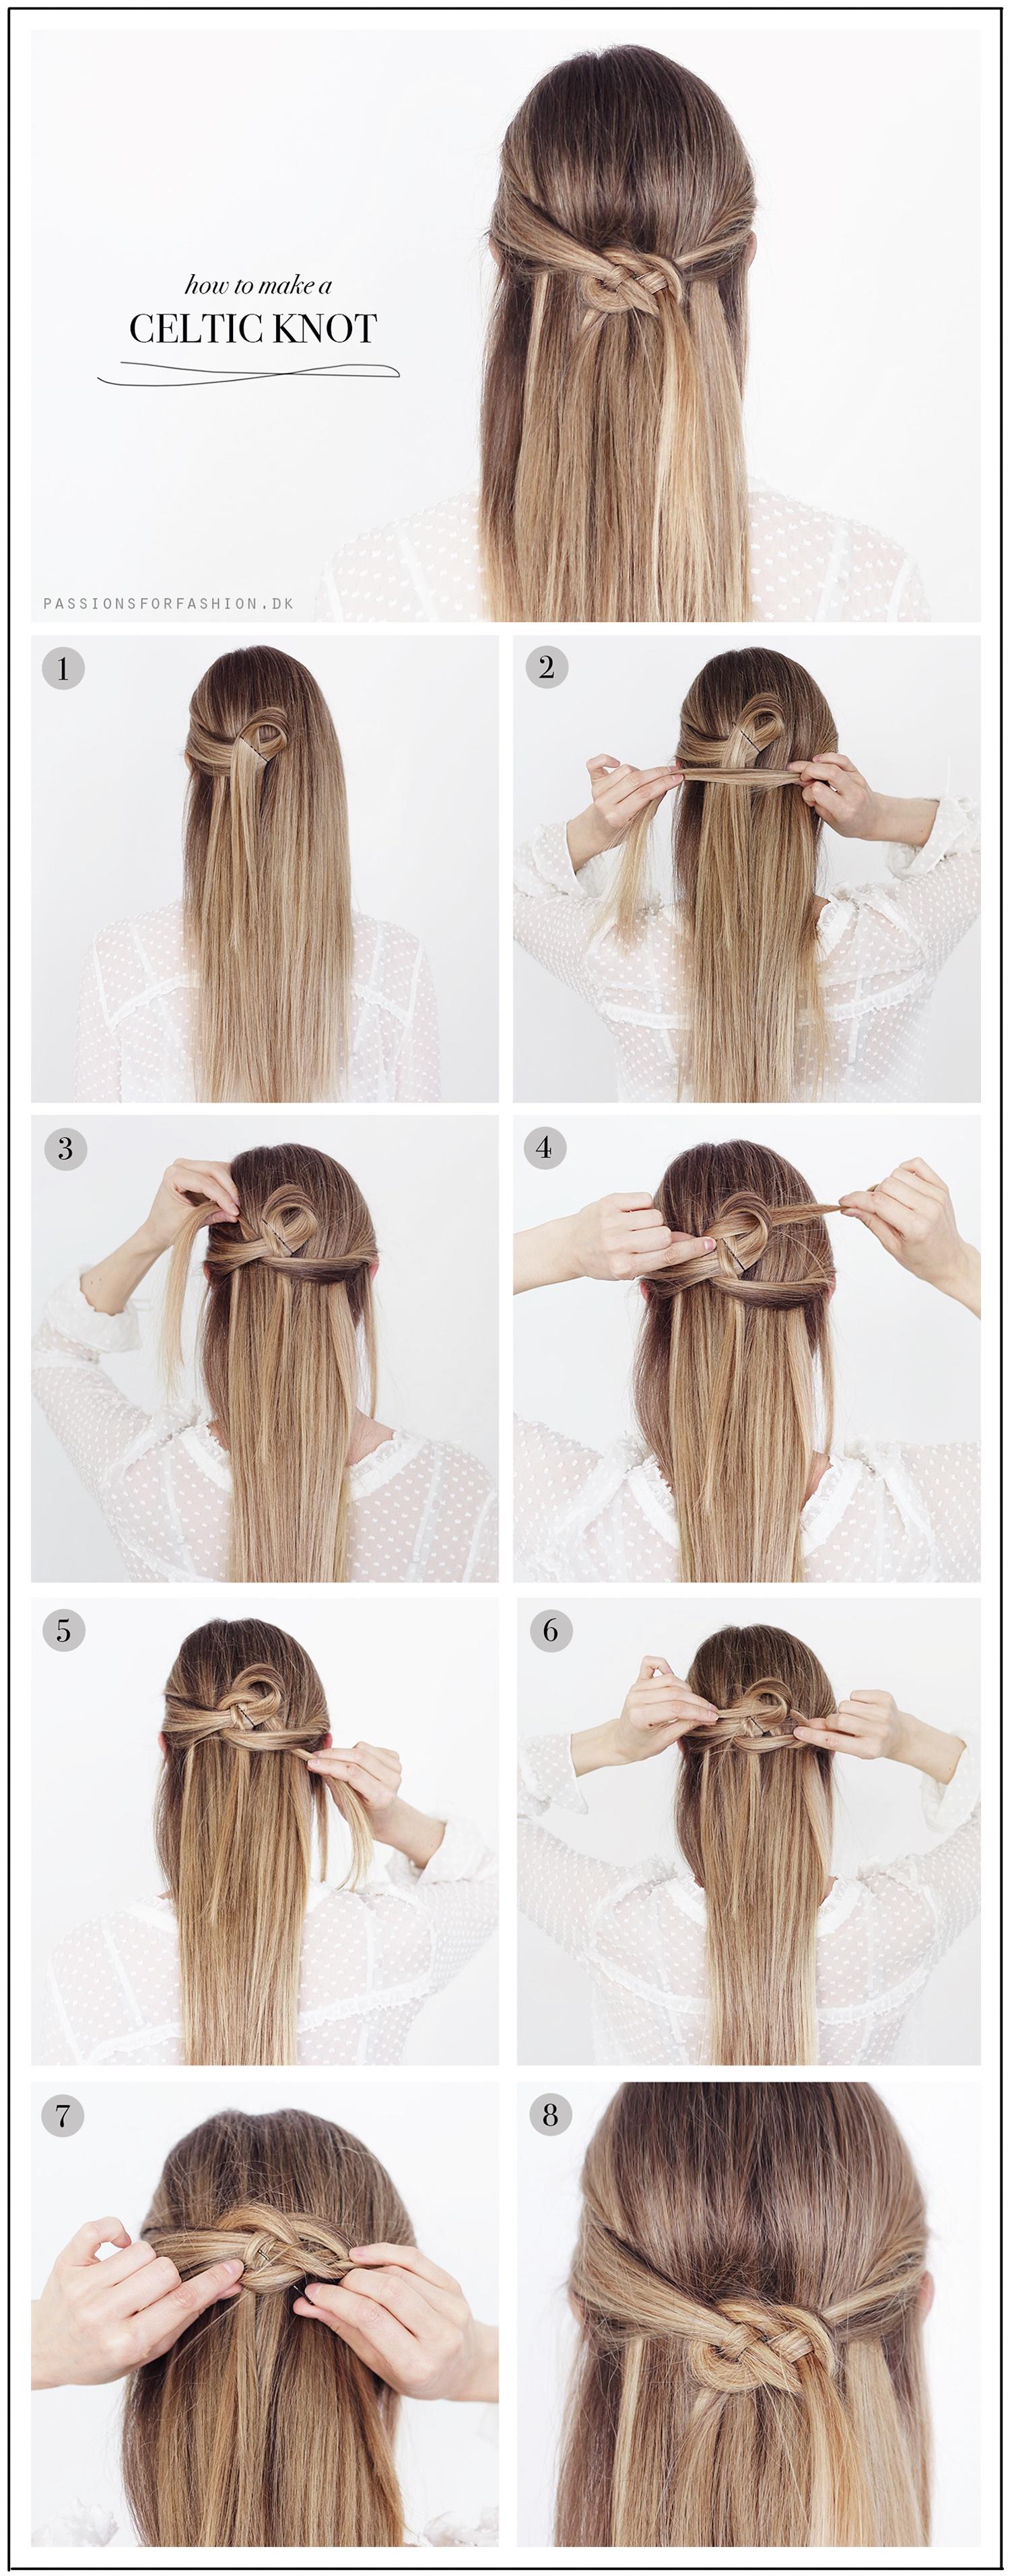 hairdo-håropsætning-frisure-hairdo-modeblog@2x